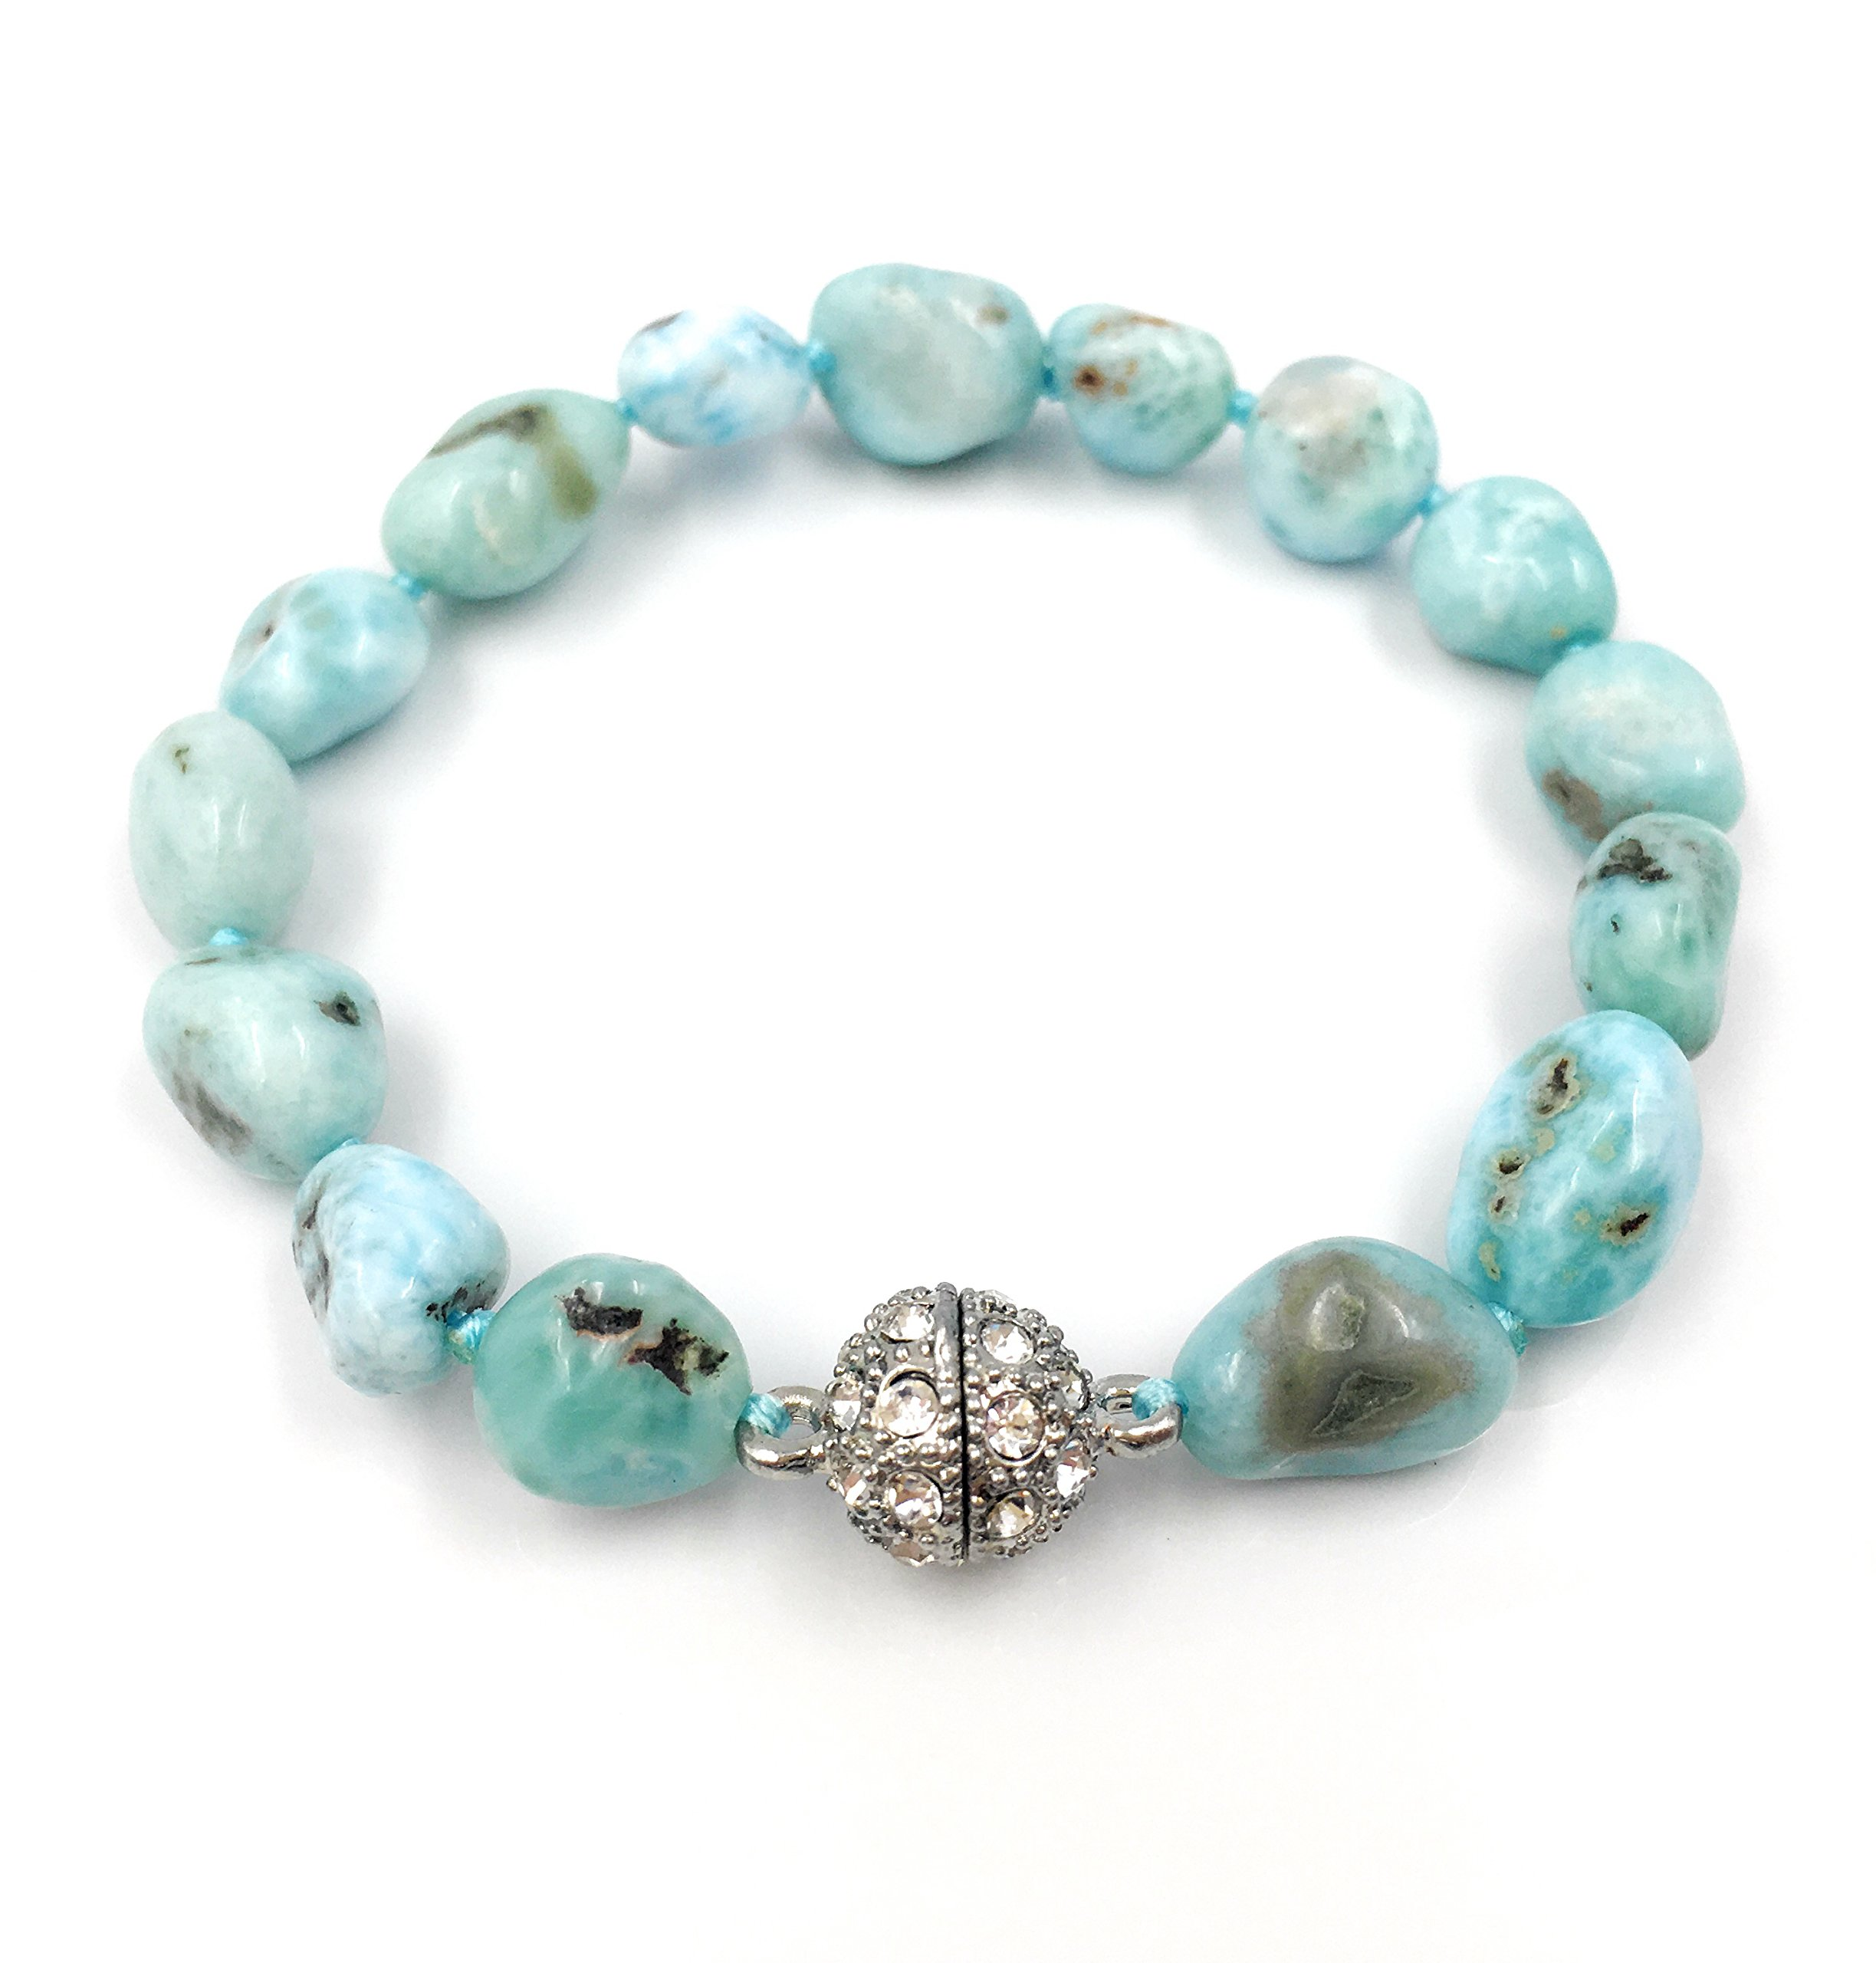 Natural Stone Larimar Bracelet Crystal Magnet Clasp 7.5'' ... by Lii Ji